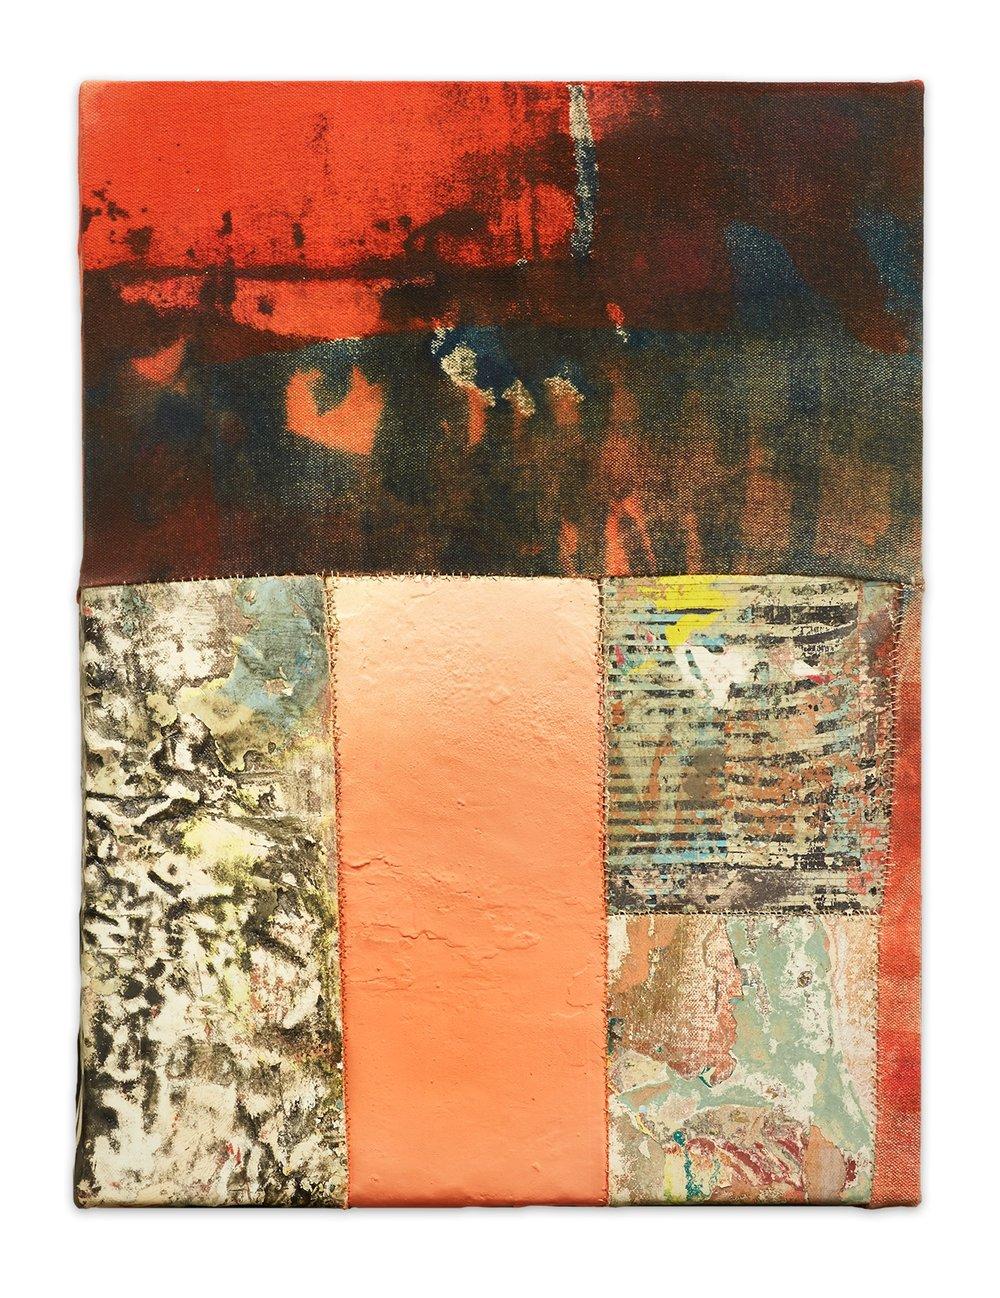 Untitled [Migration Grid Series]